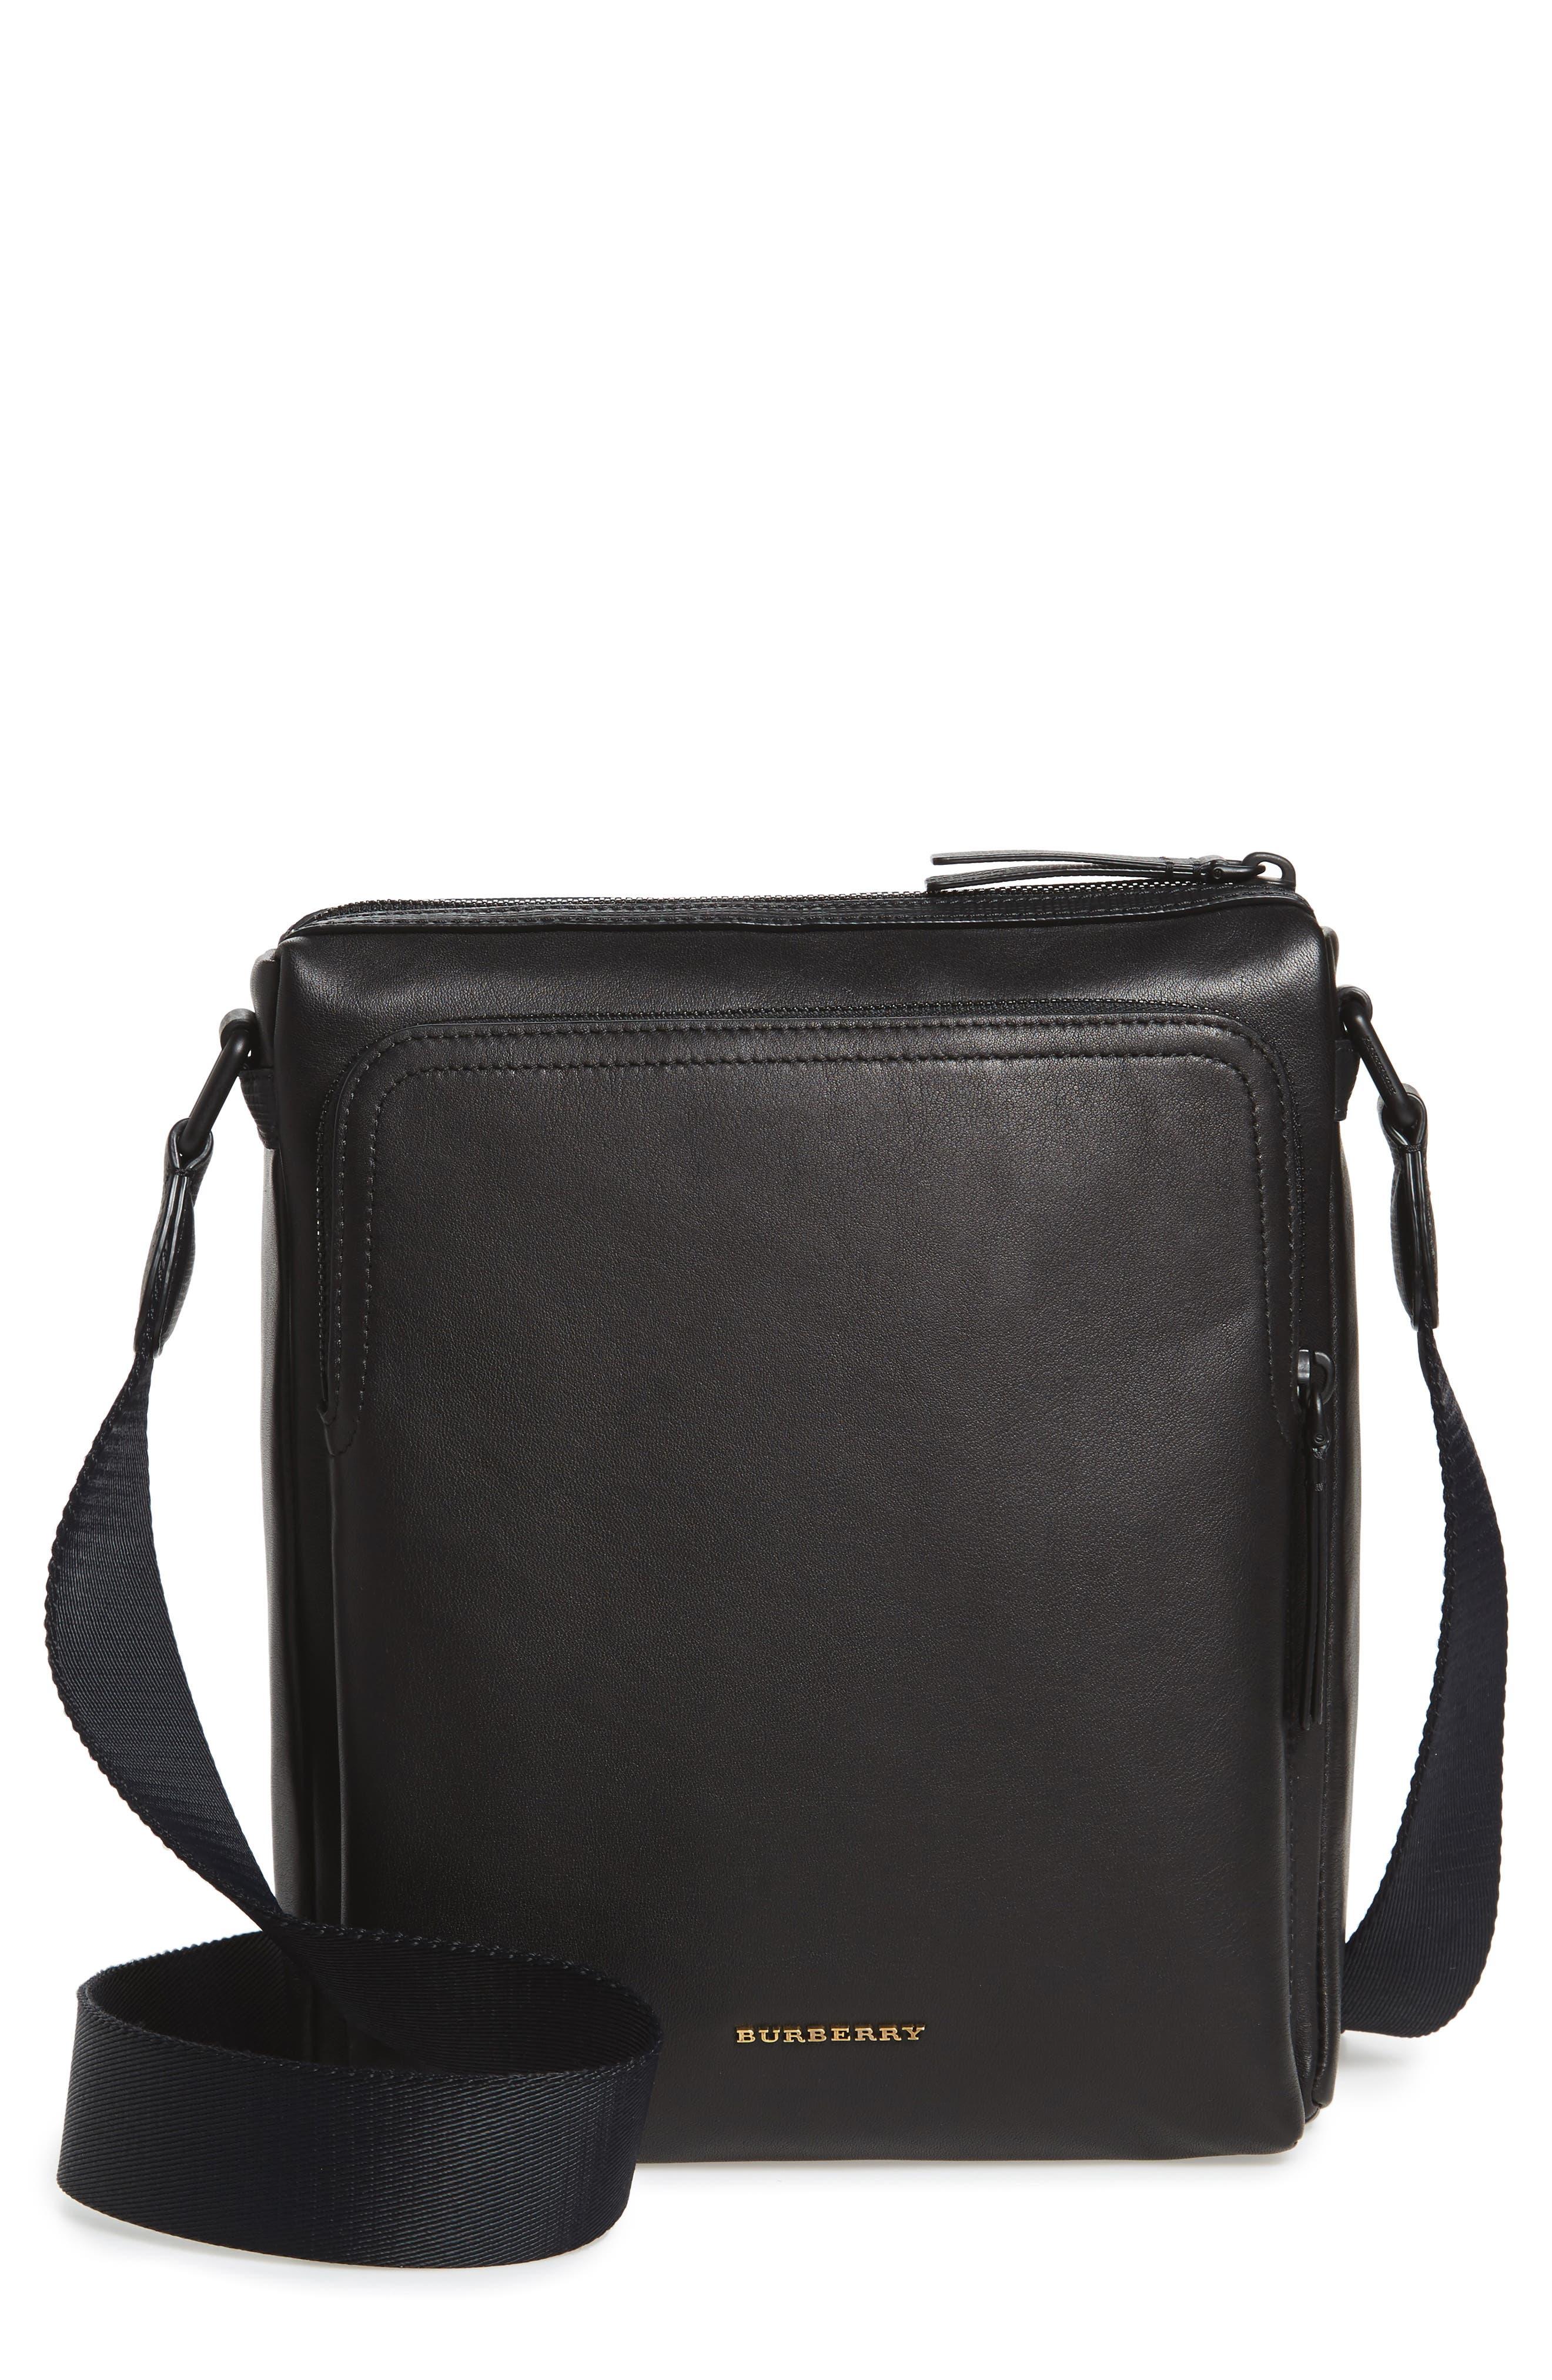 Burberry Aldgate Messenger Bag